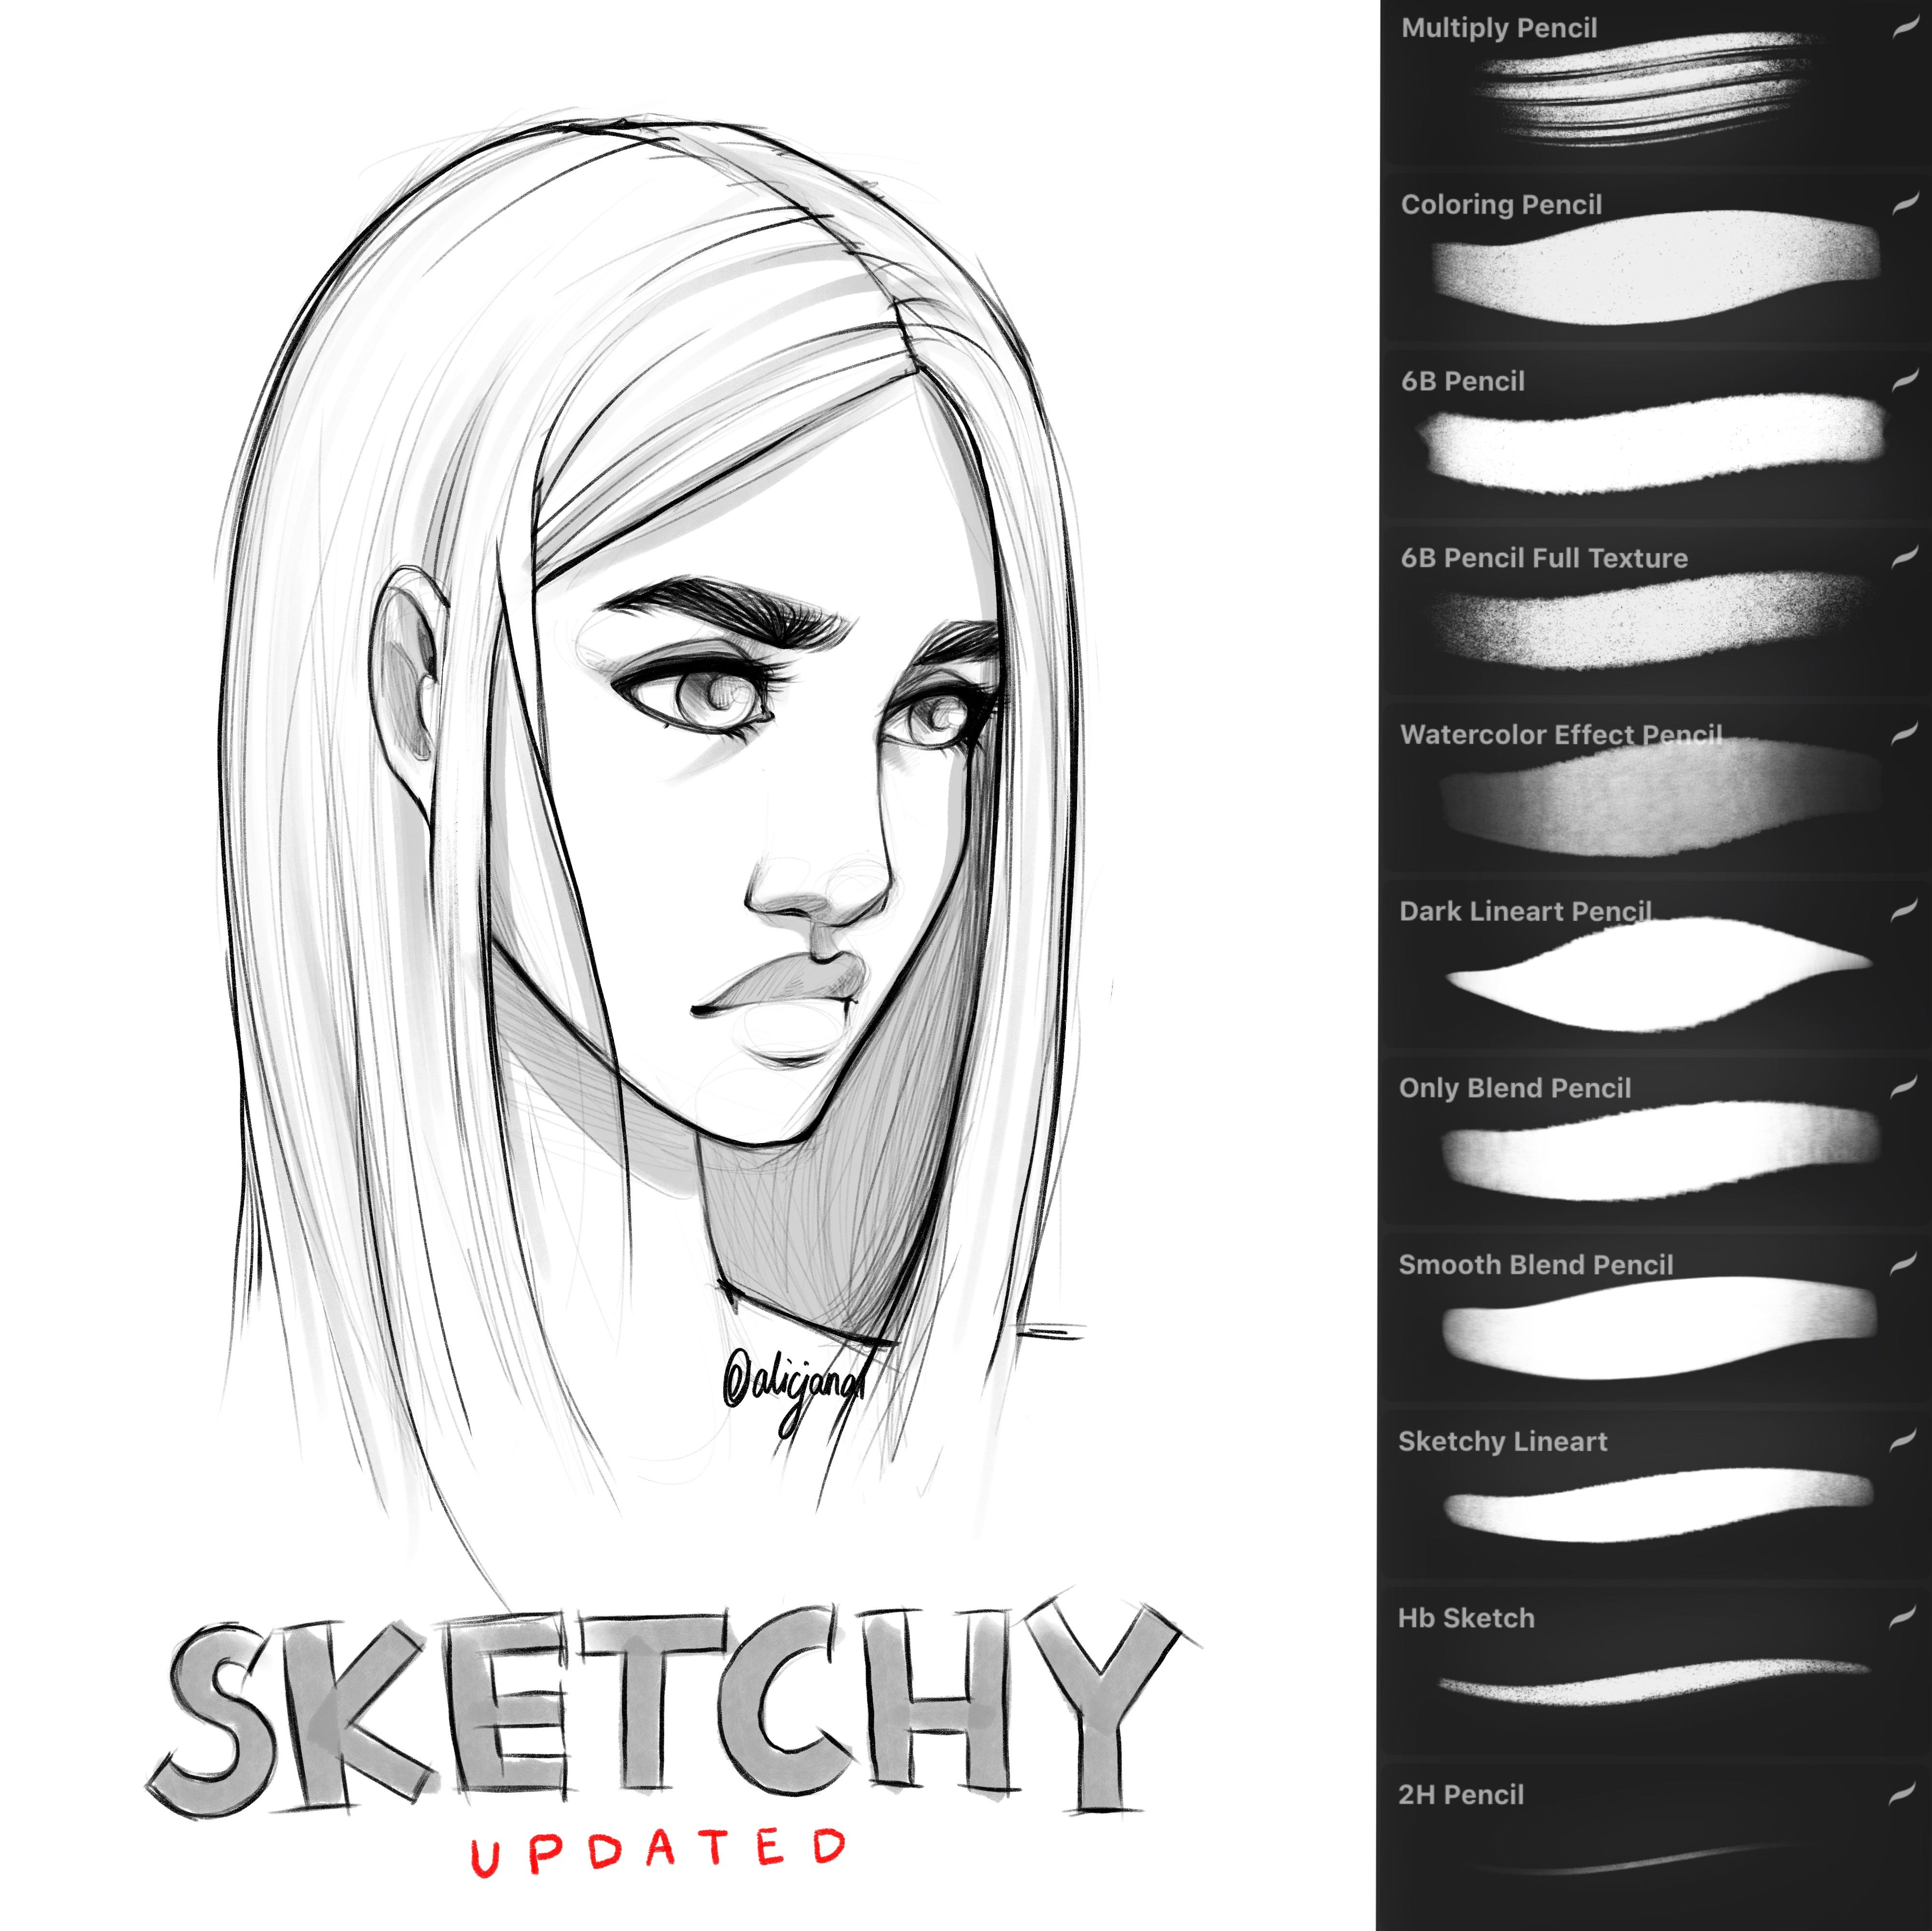 Sketchy Brush Set For Procreate Procreate Brushes Free Procreate Brushes Procreate